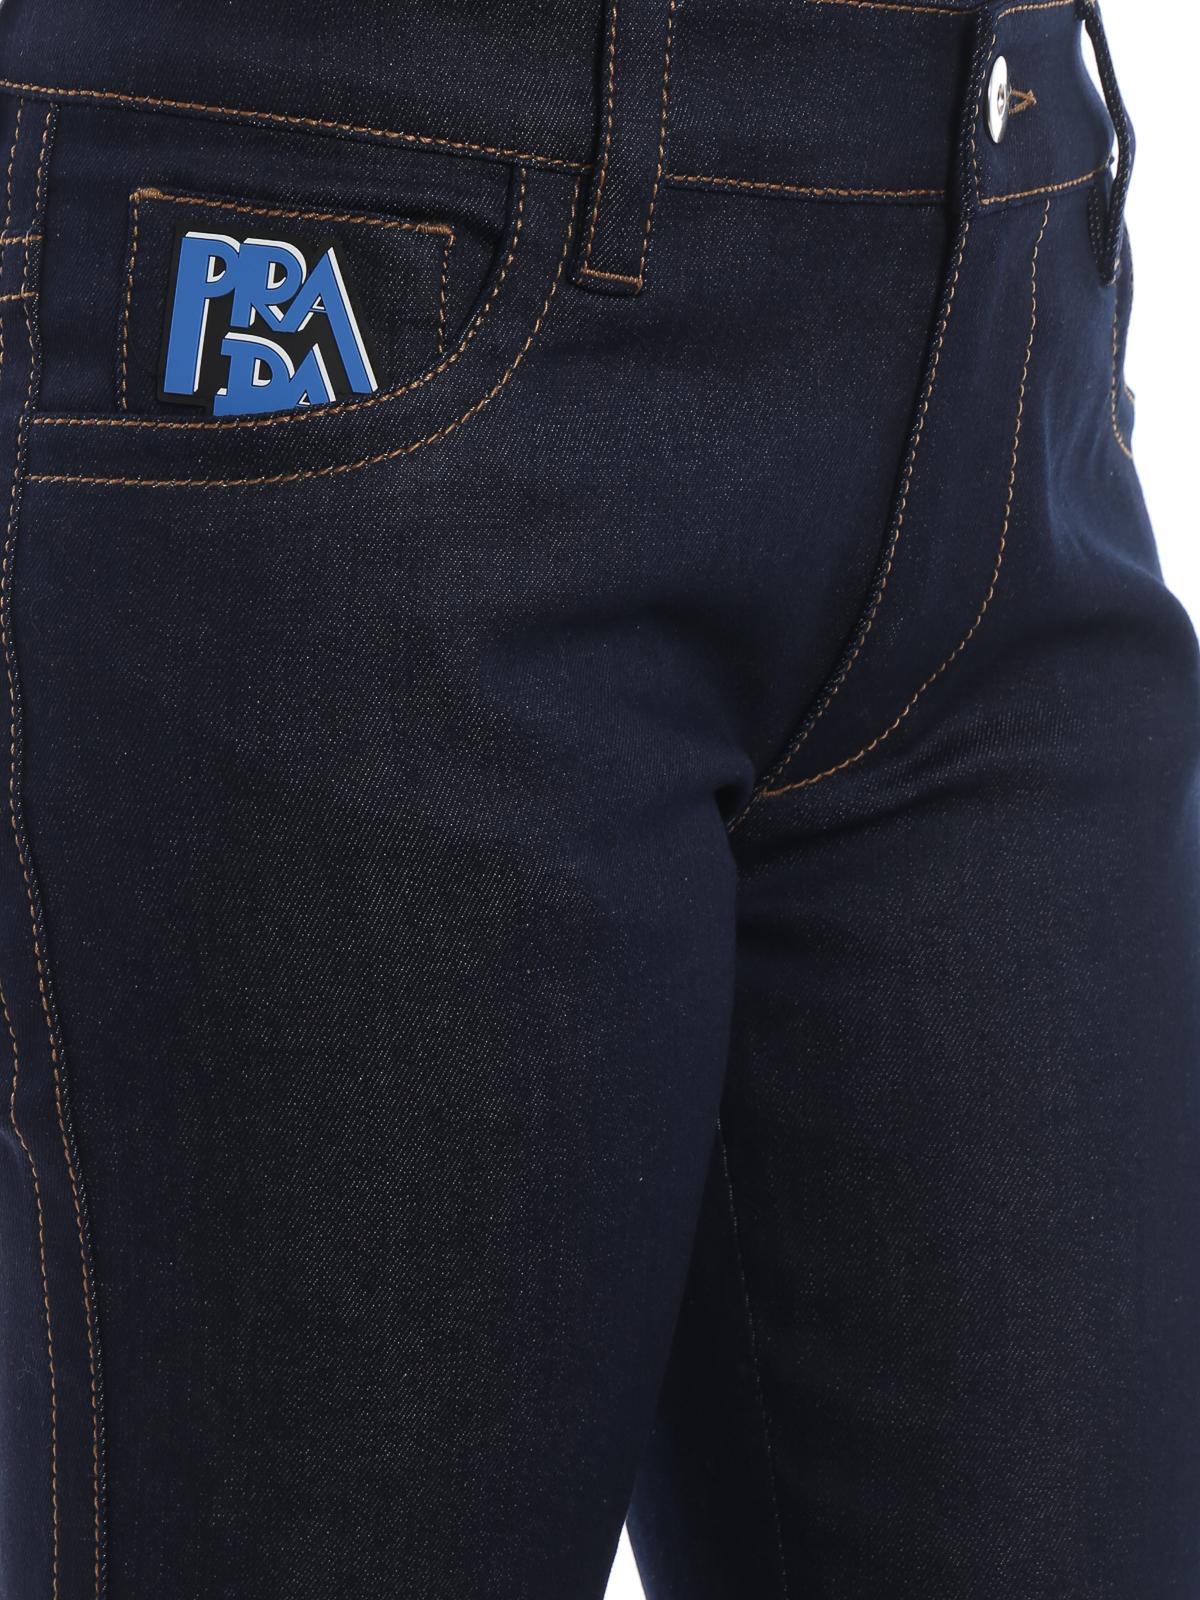 new style 25df4 023d7 Prada - Denim jeans with rubber logo - straight leg jeans ...